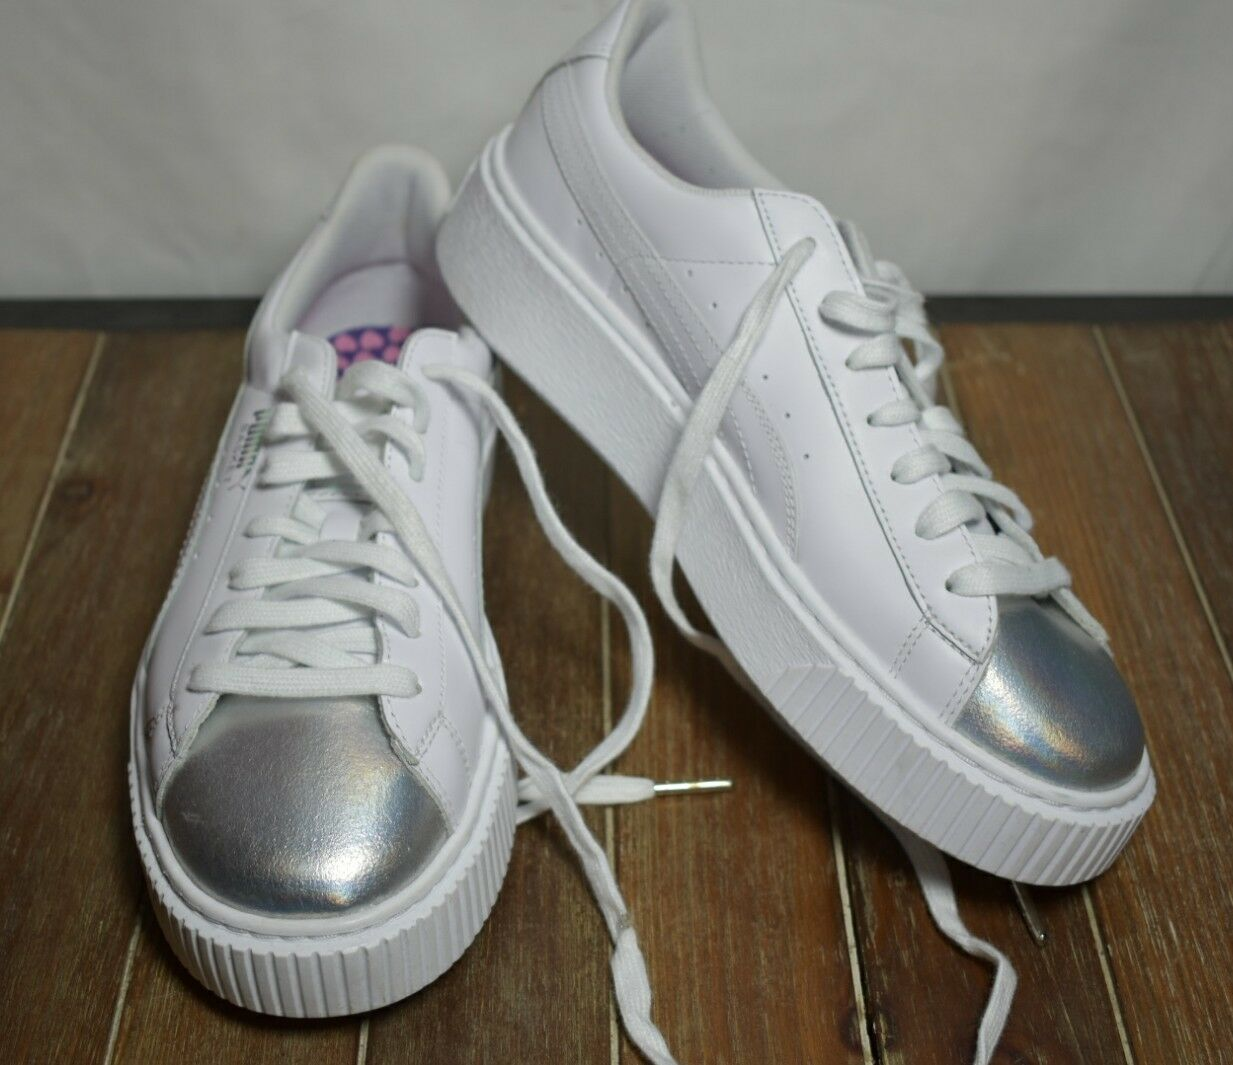 Puma Basket Platform Metallic Womens White Leather Lace Lace Lace Up Sneakers shoes b59ea9